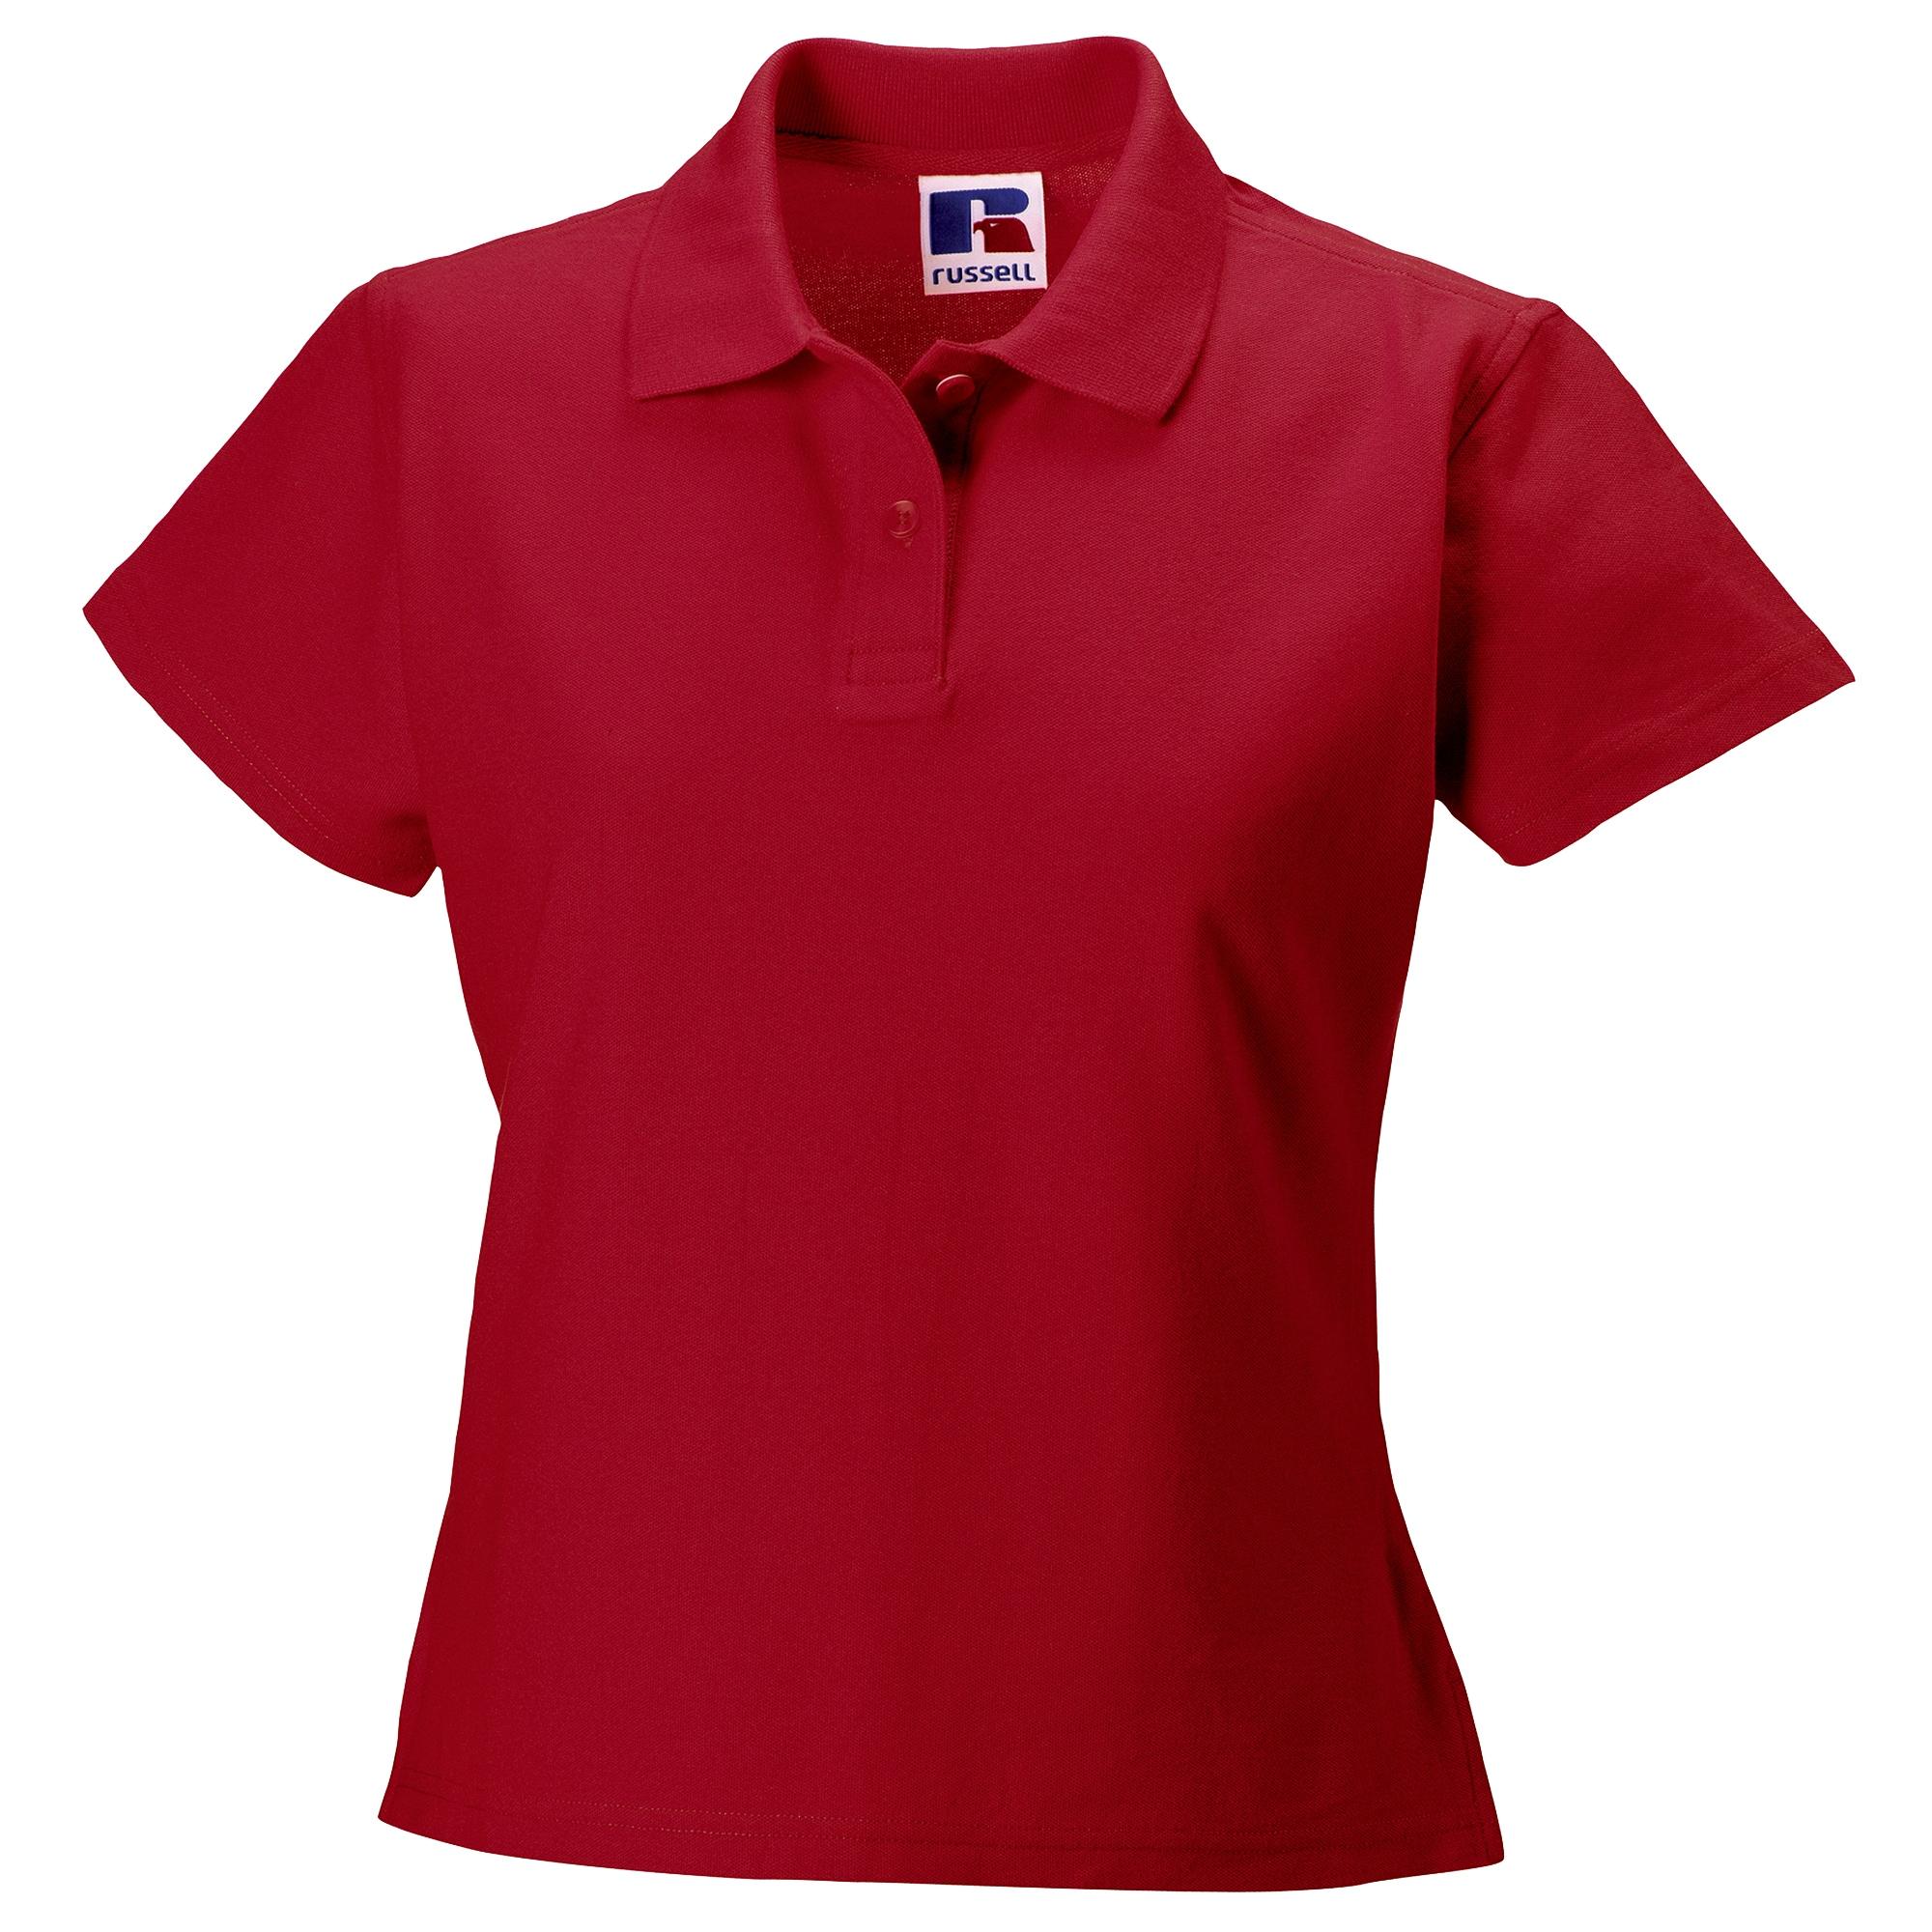 russell -  Poloshirt Damen Polo Shirt Europe Ultimate Klassik Kurzarm